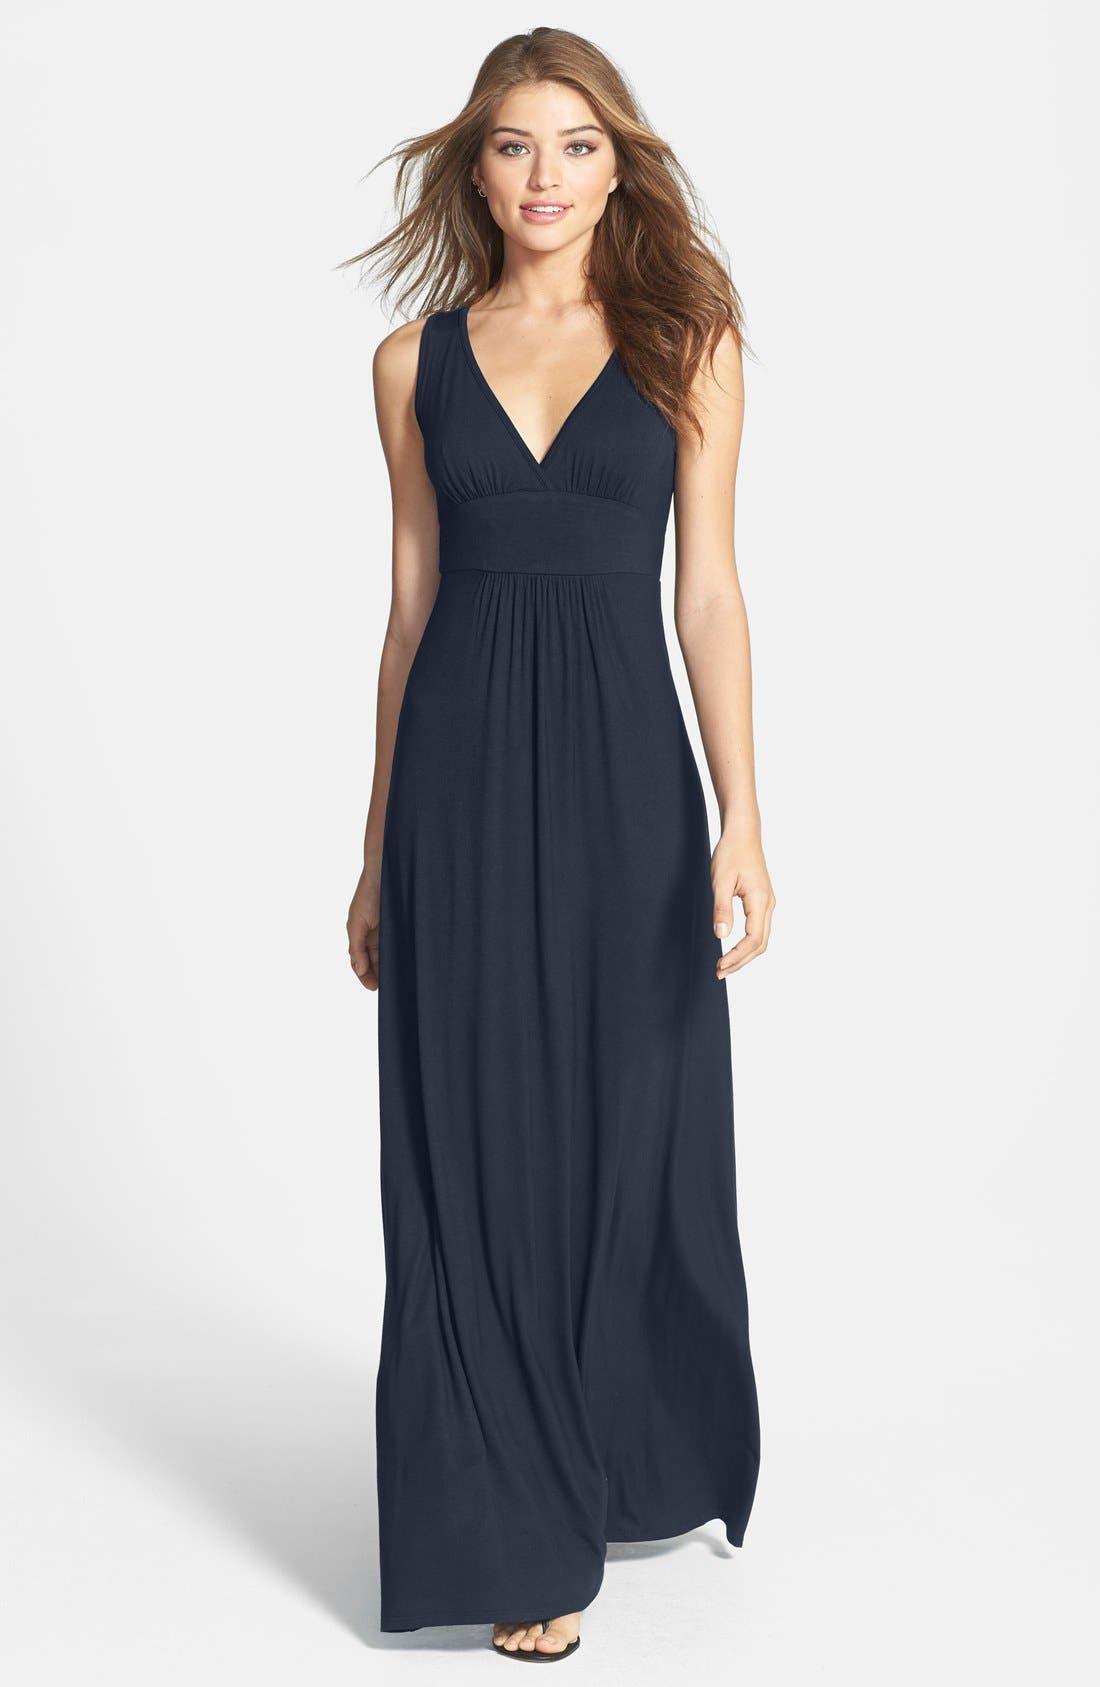 Maxi dress formal petite